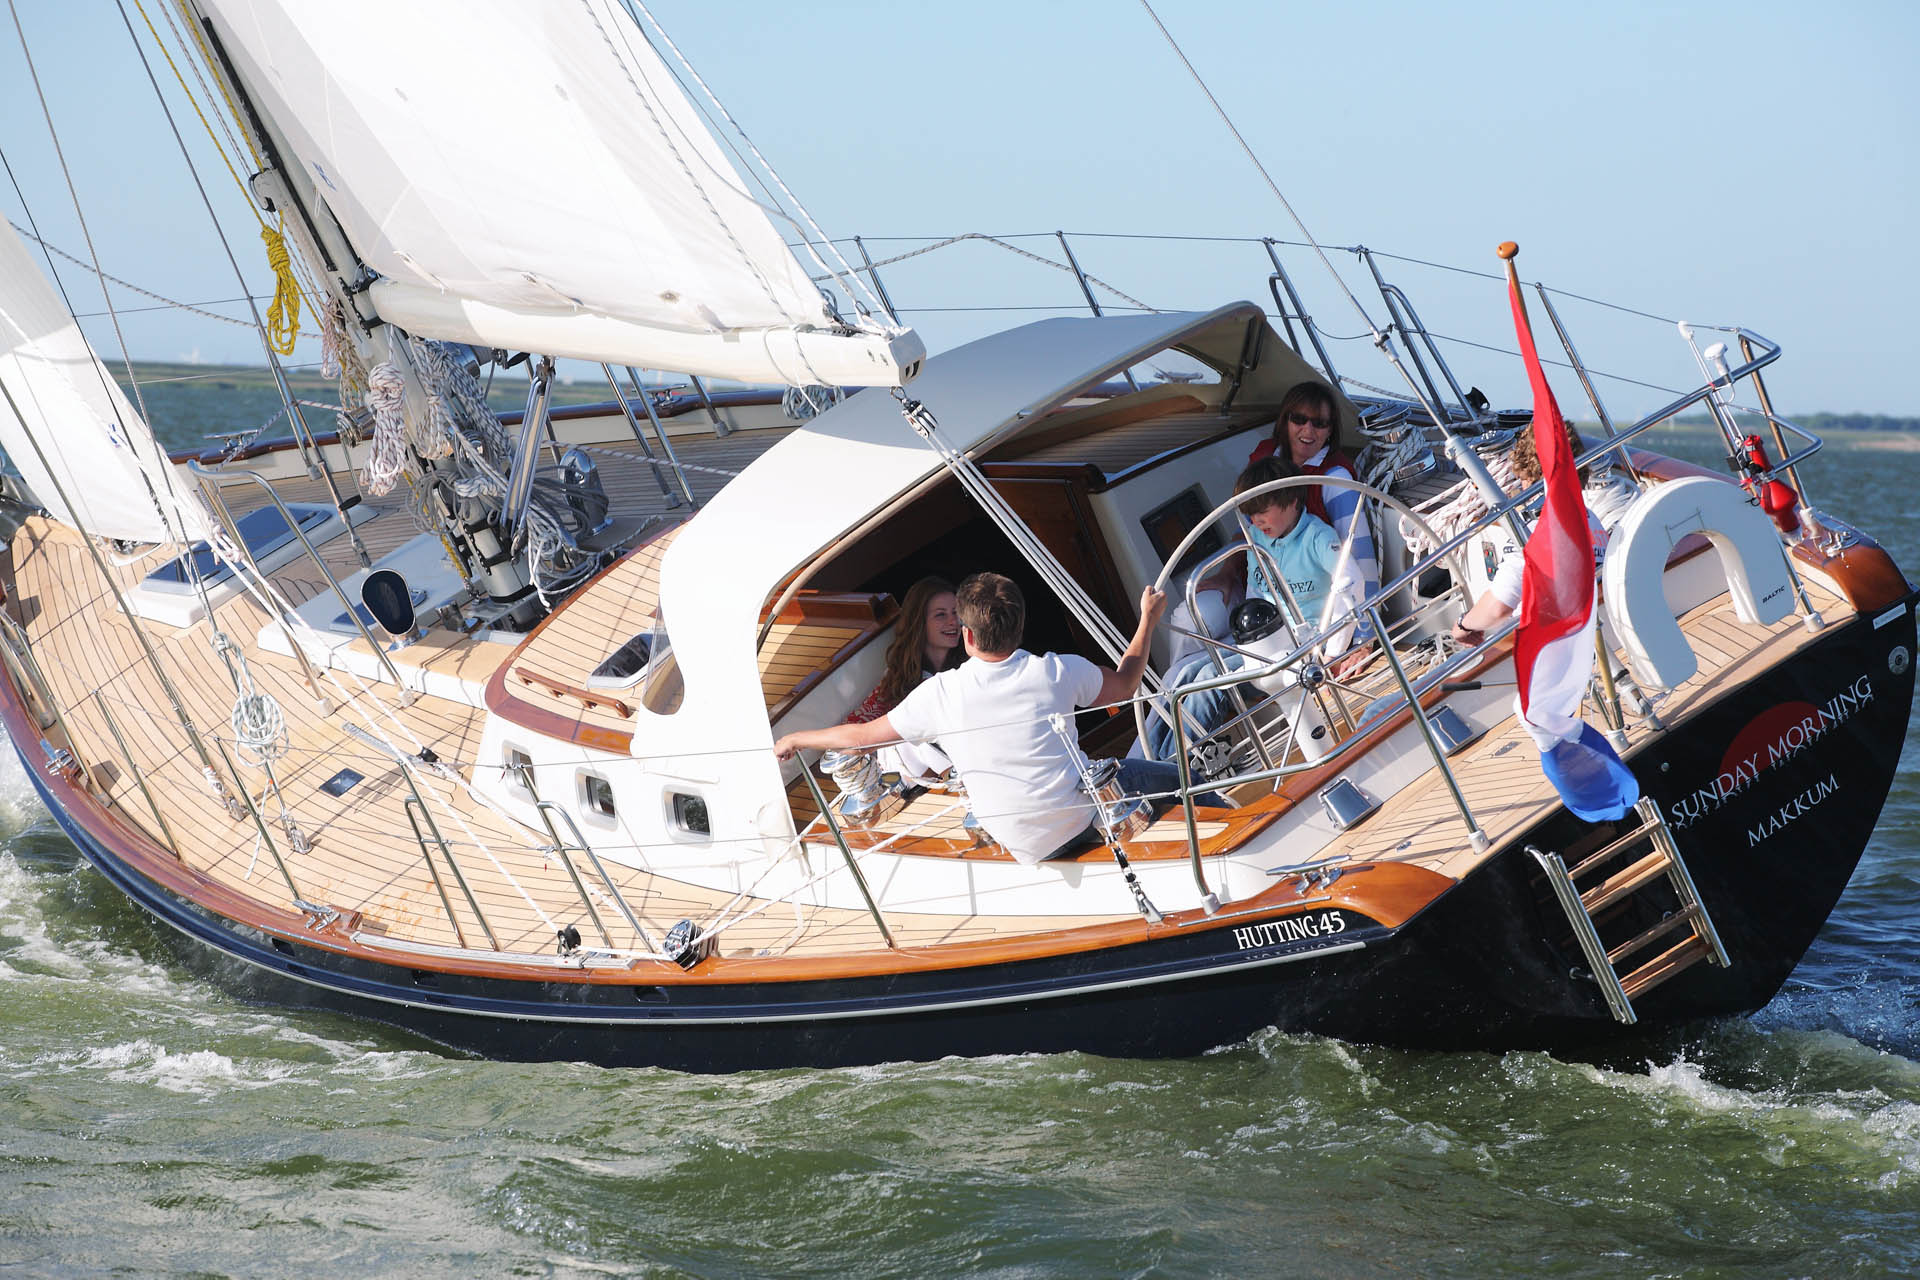 Hutting 45 Hutting yachts